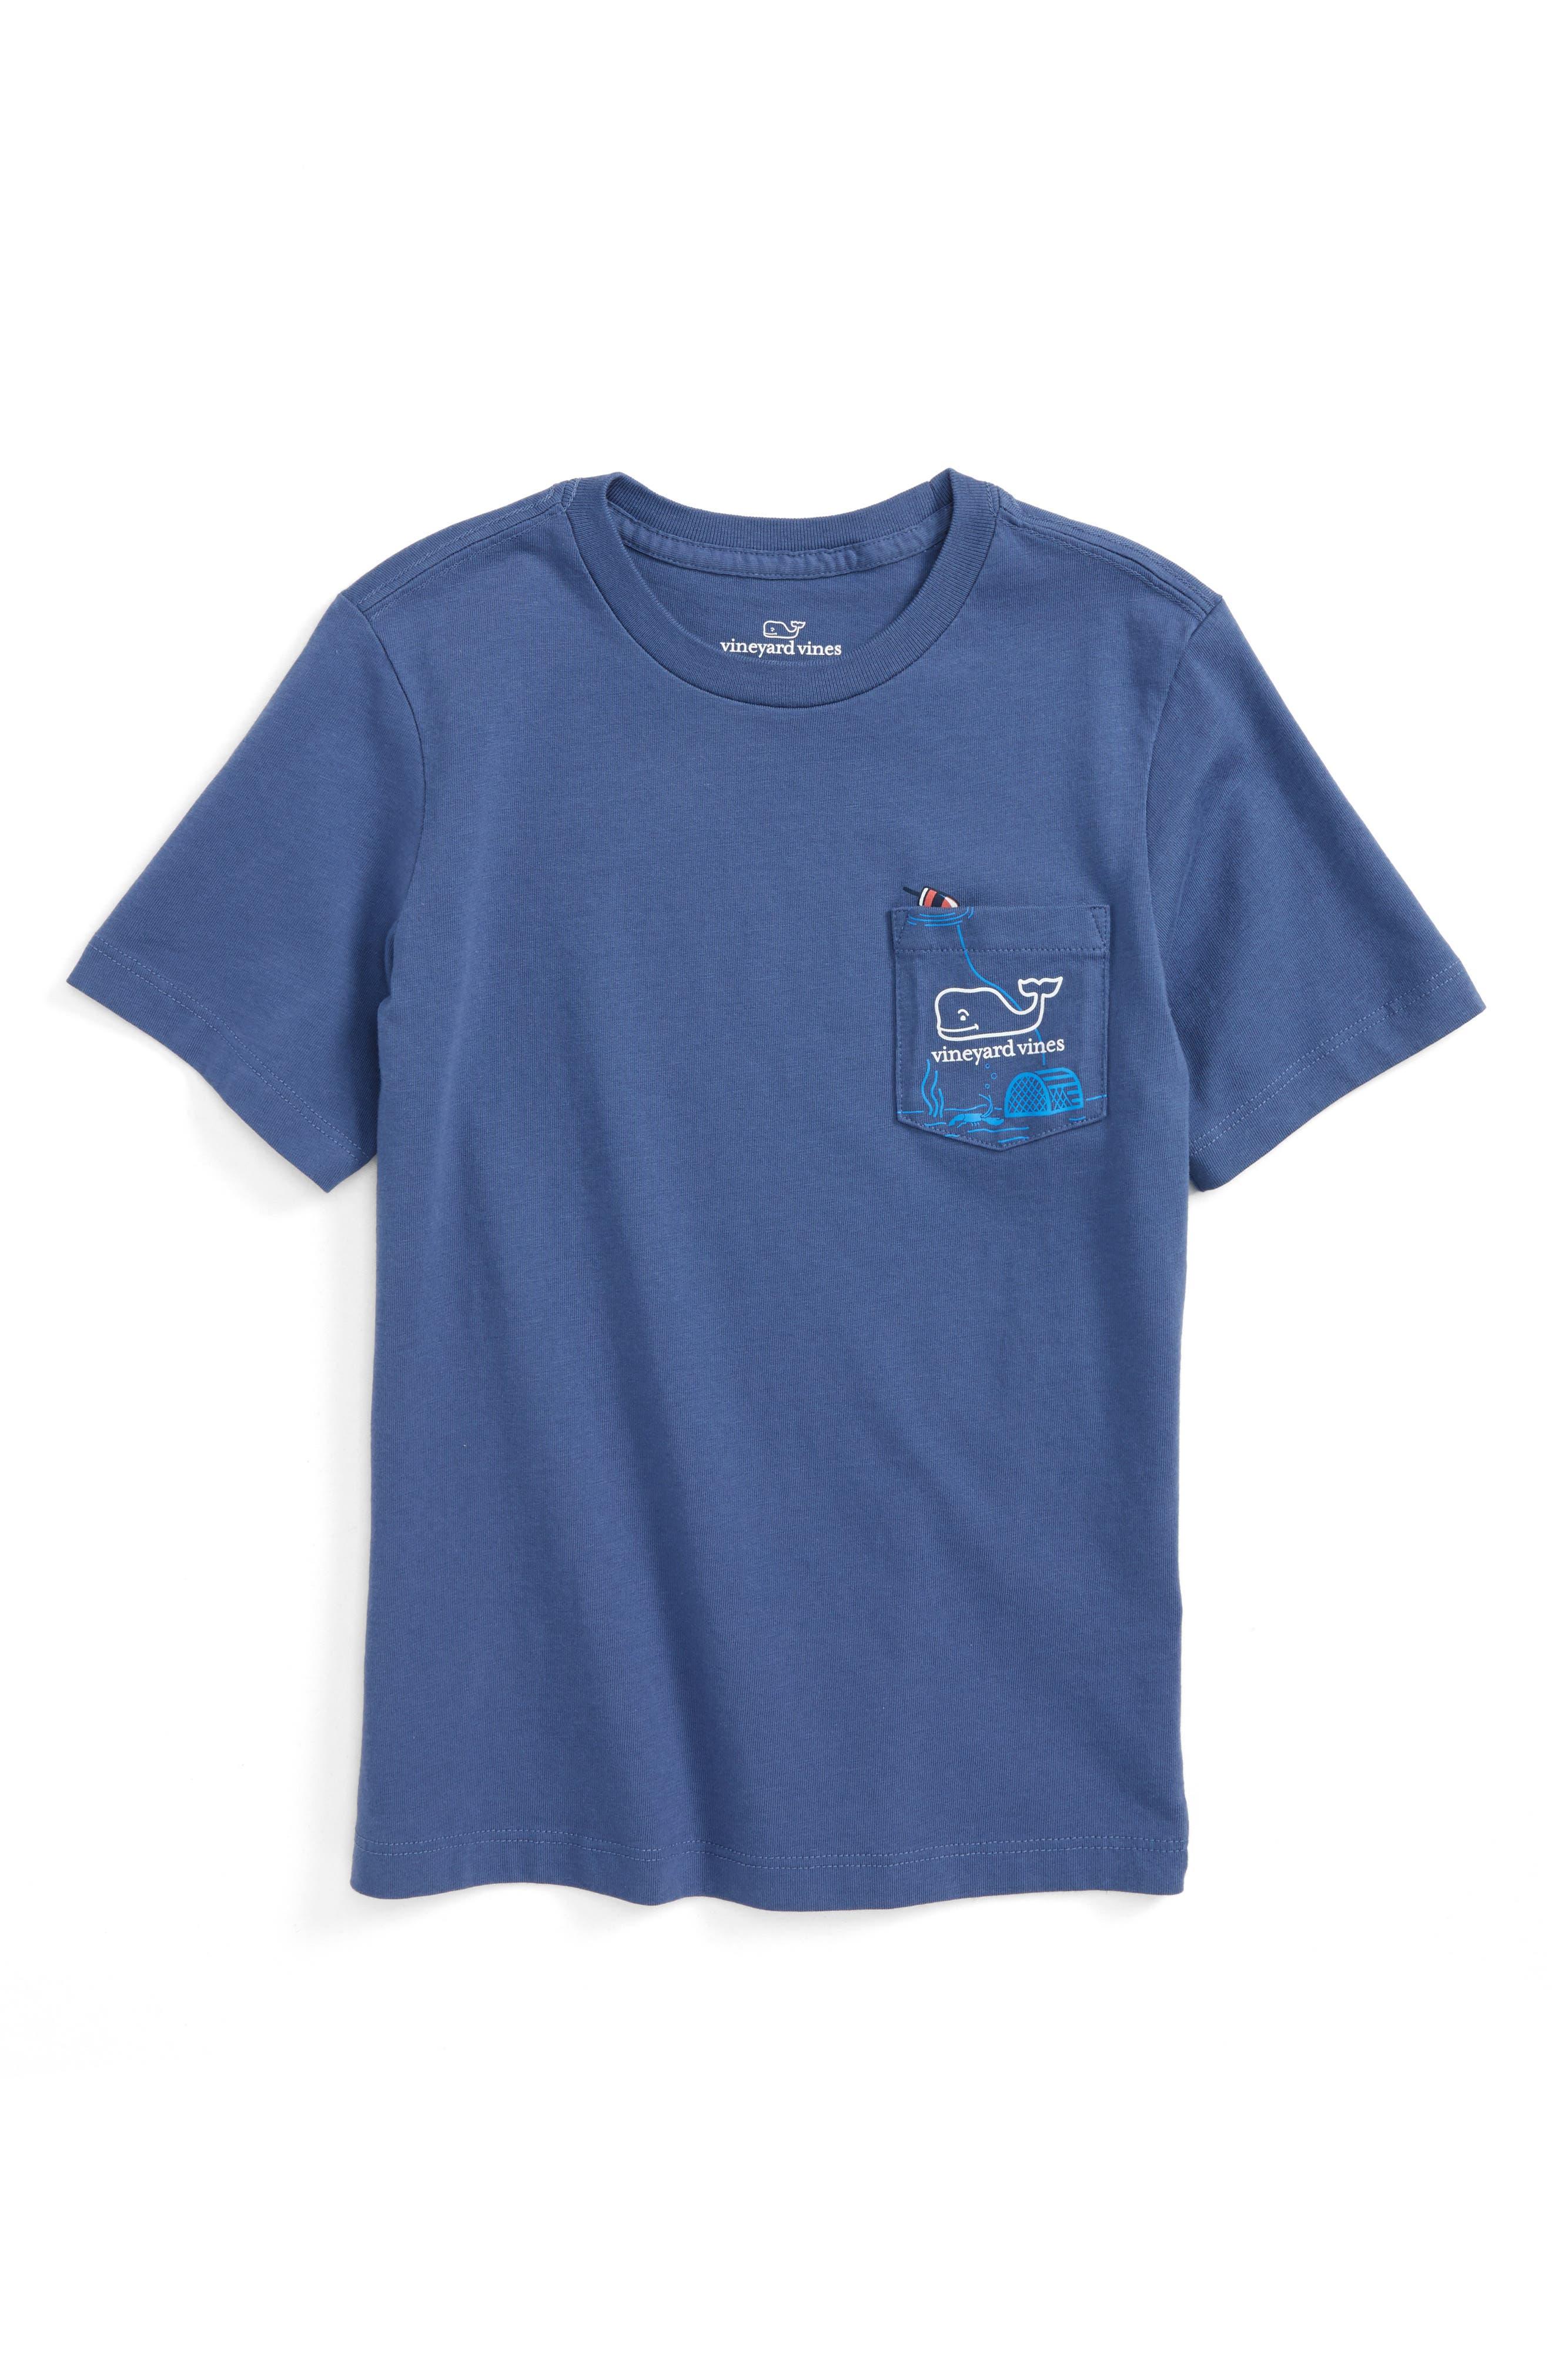 Vineyard Vines Lobster Trap Cotton T-Shirt (Toddler Boys, Little Boys & Big Boys)